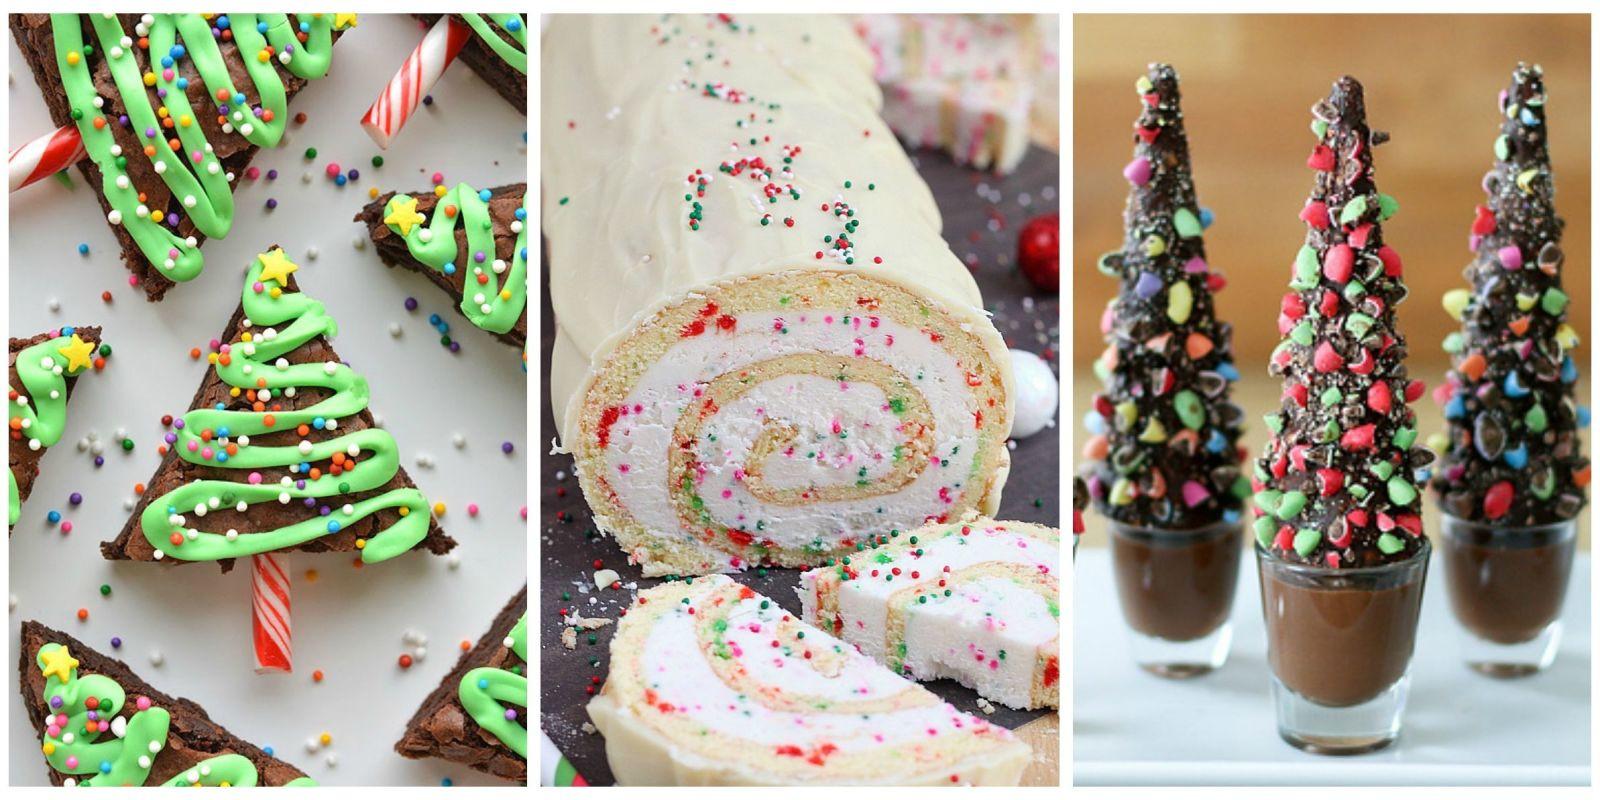 Fun Easy Christmas Desserts  57 Easy Christmas Dessert Recipes Best Ideas for Fun